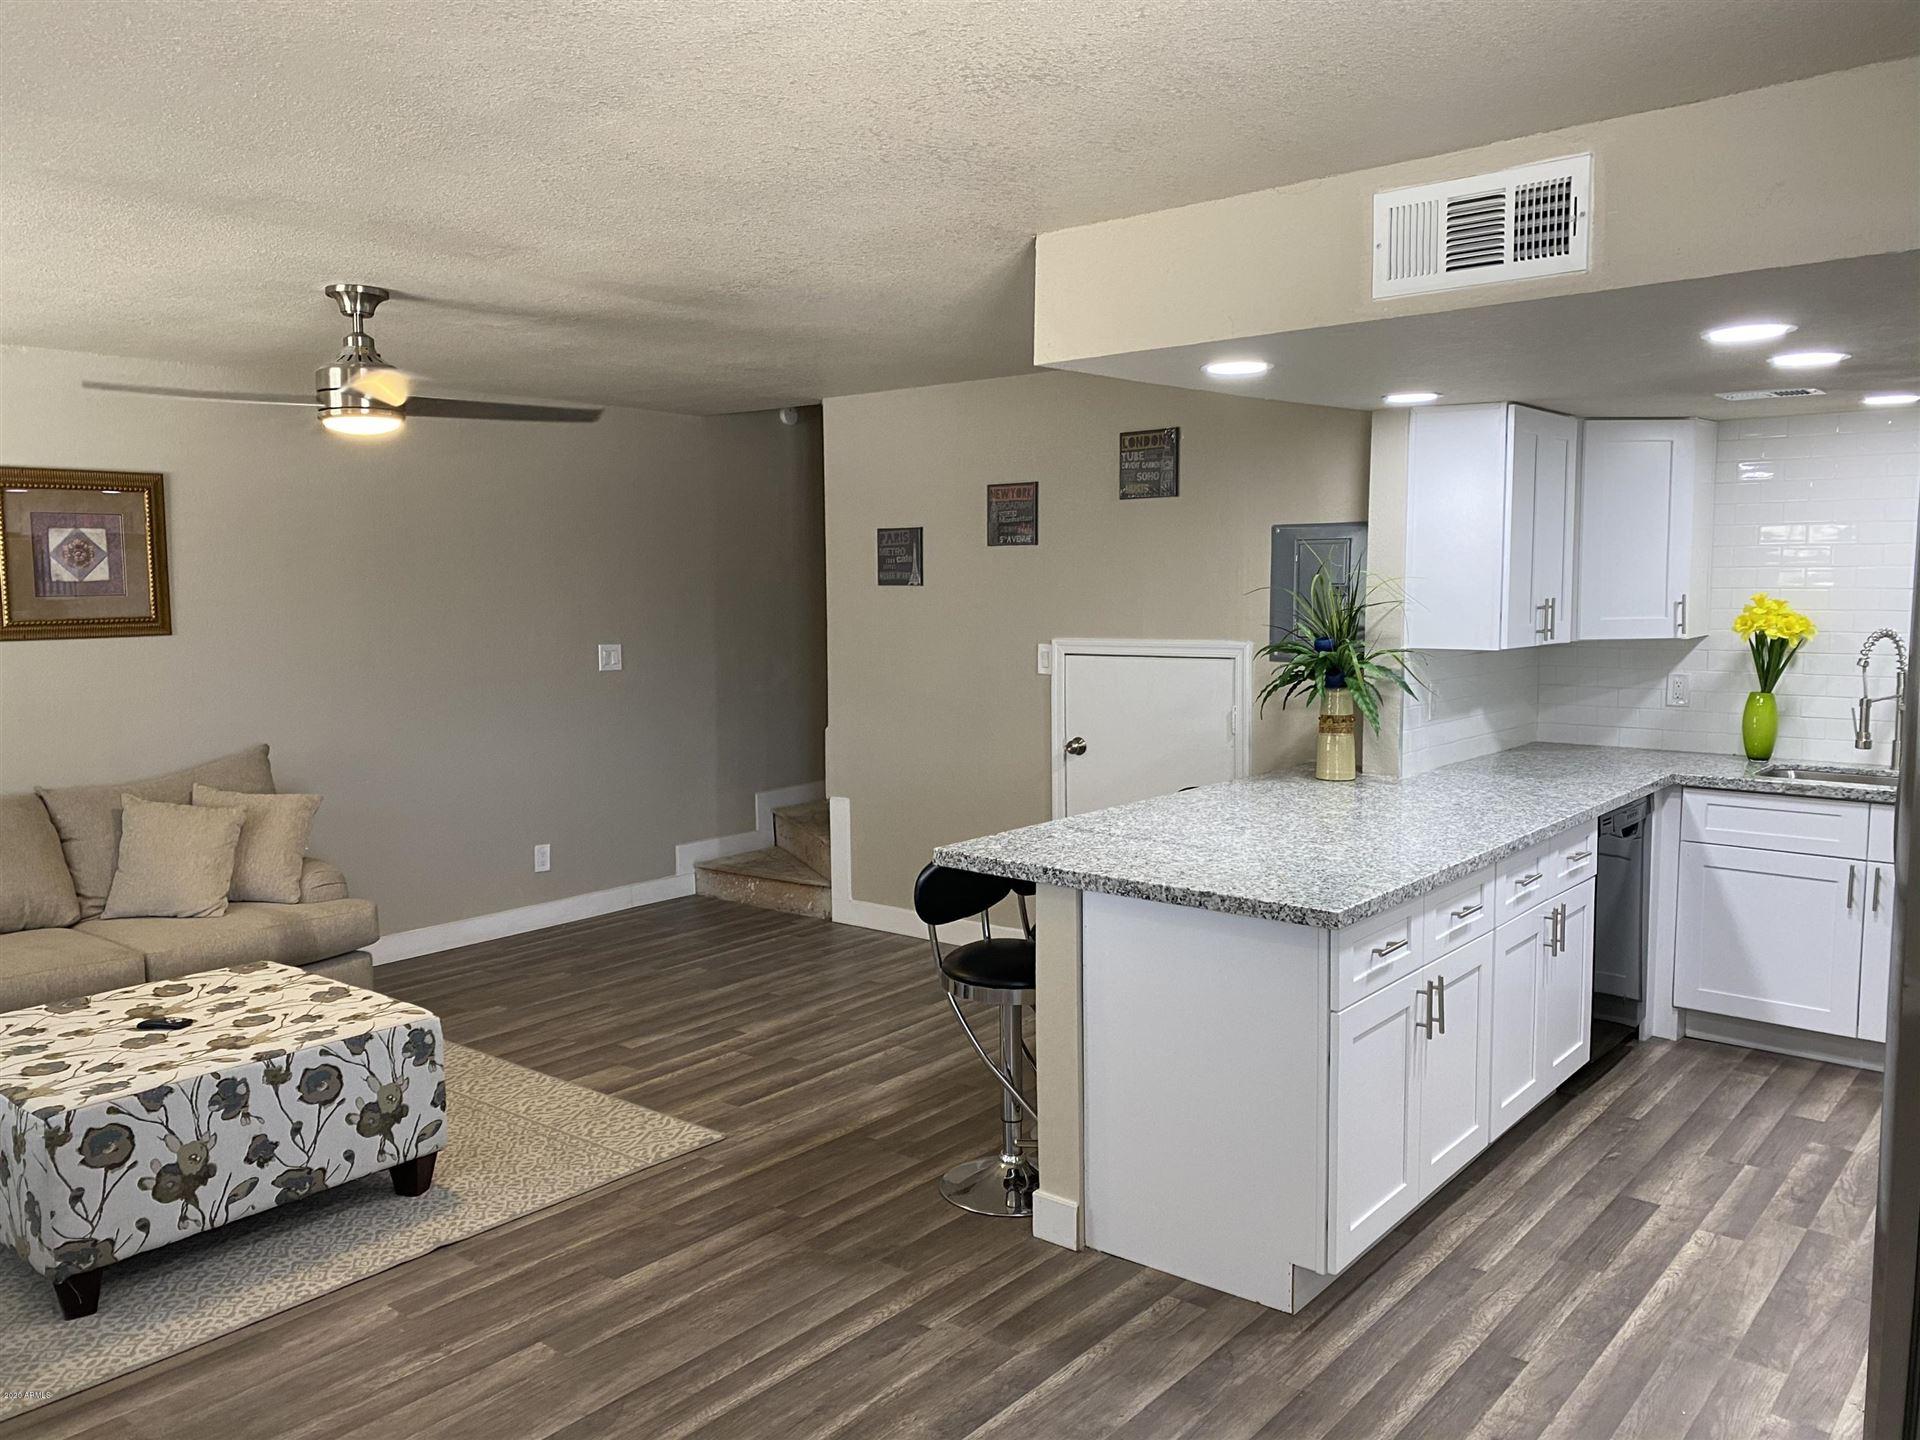 4749 E BELLEVIEW Street, Phoenix, AZ 85008 - MLS#: 6096496